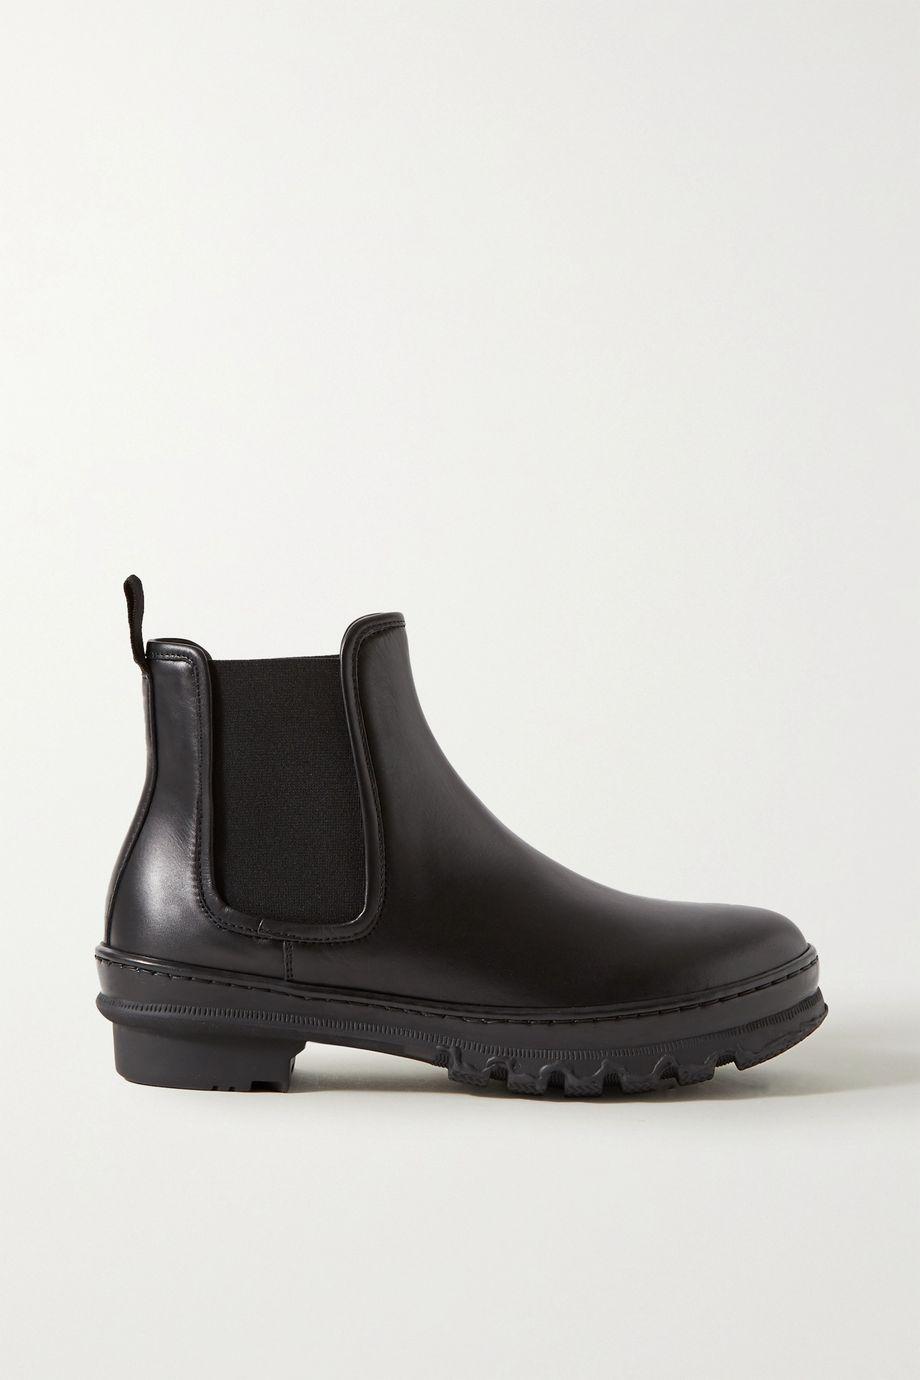 LEGRES Graden leather Chelsea boots